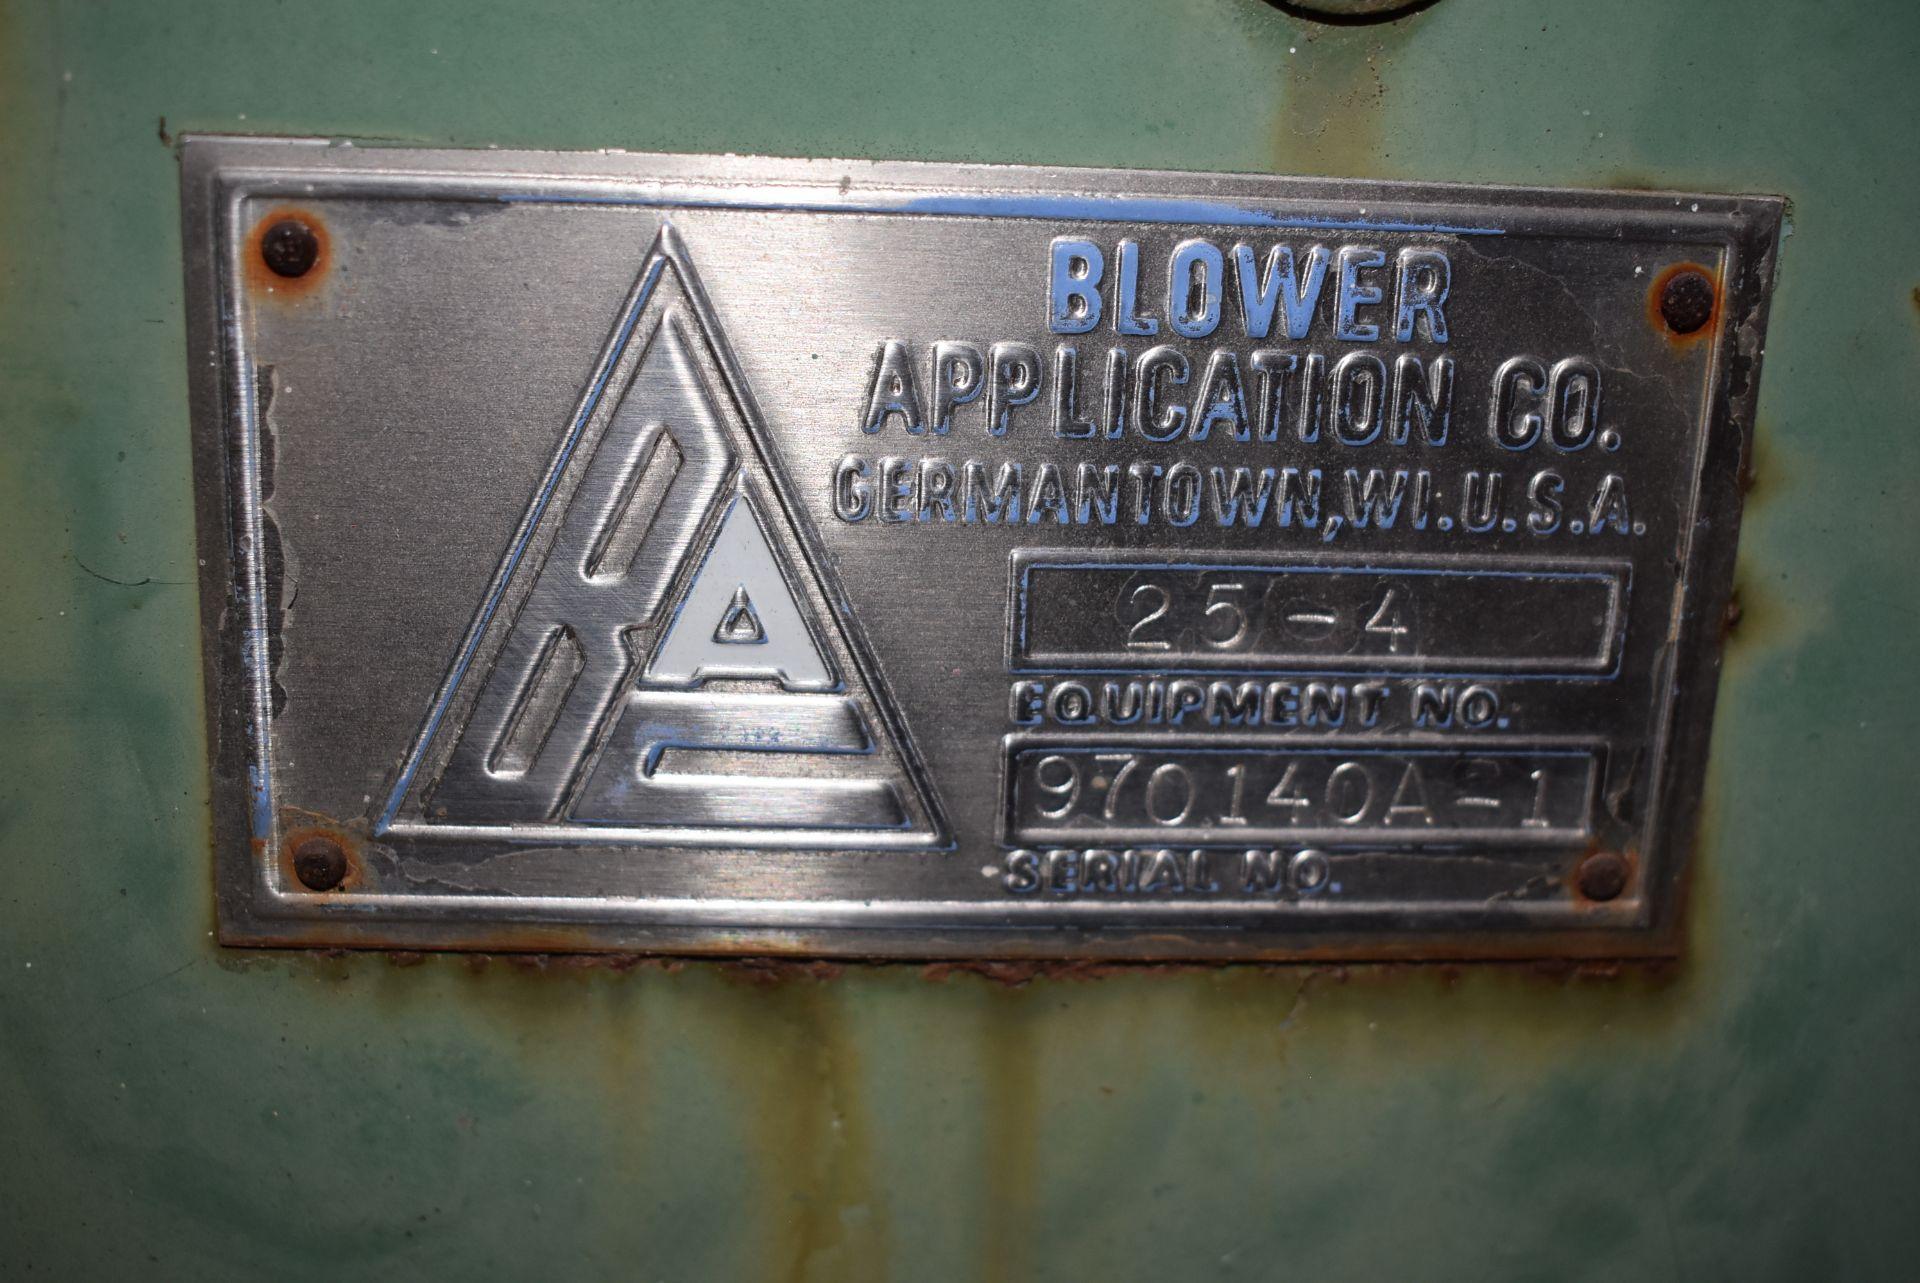 Application Company Model #25-4 Blower w/10 HP Motor - Image 2 of 3